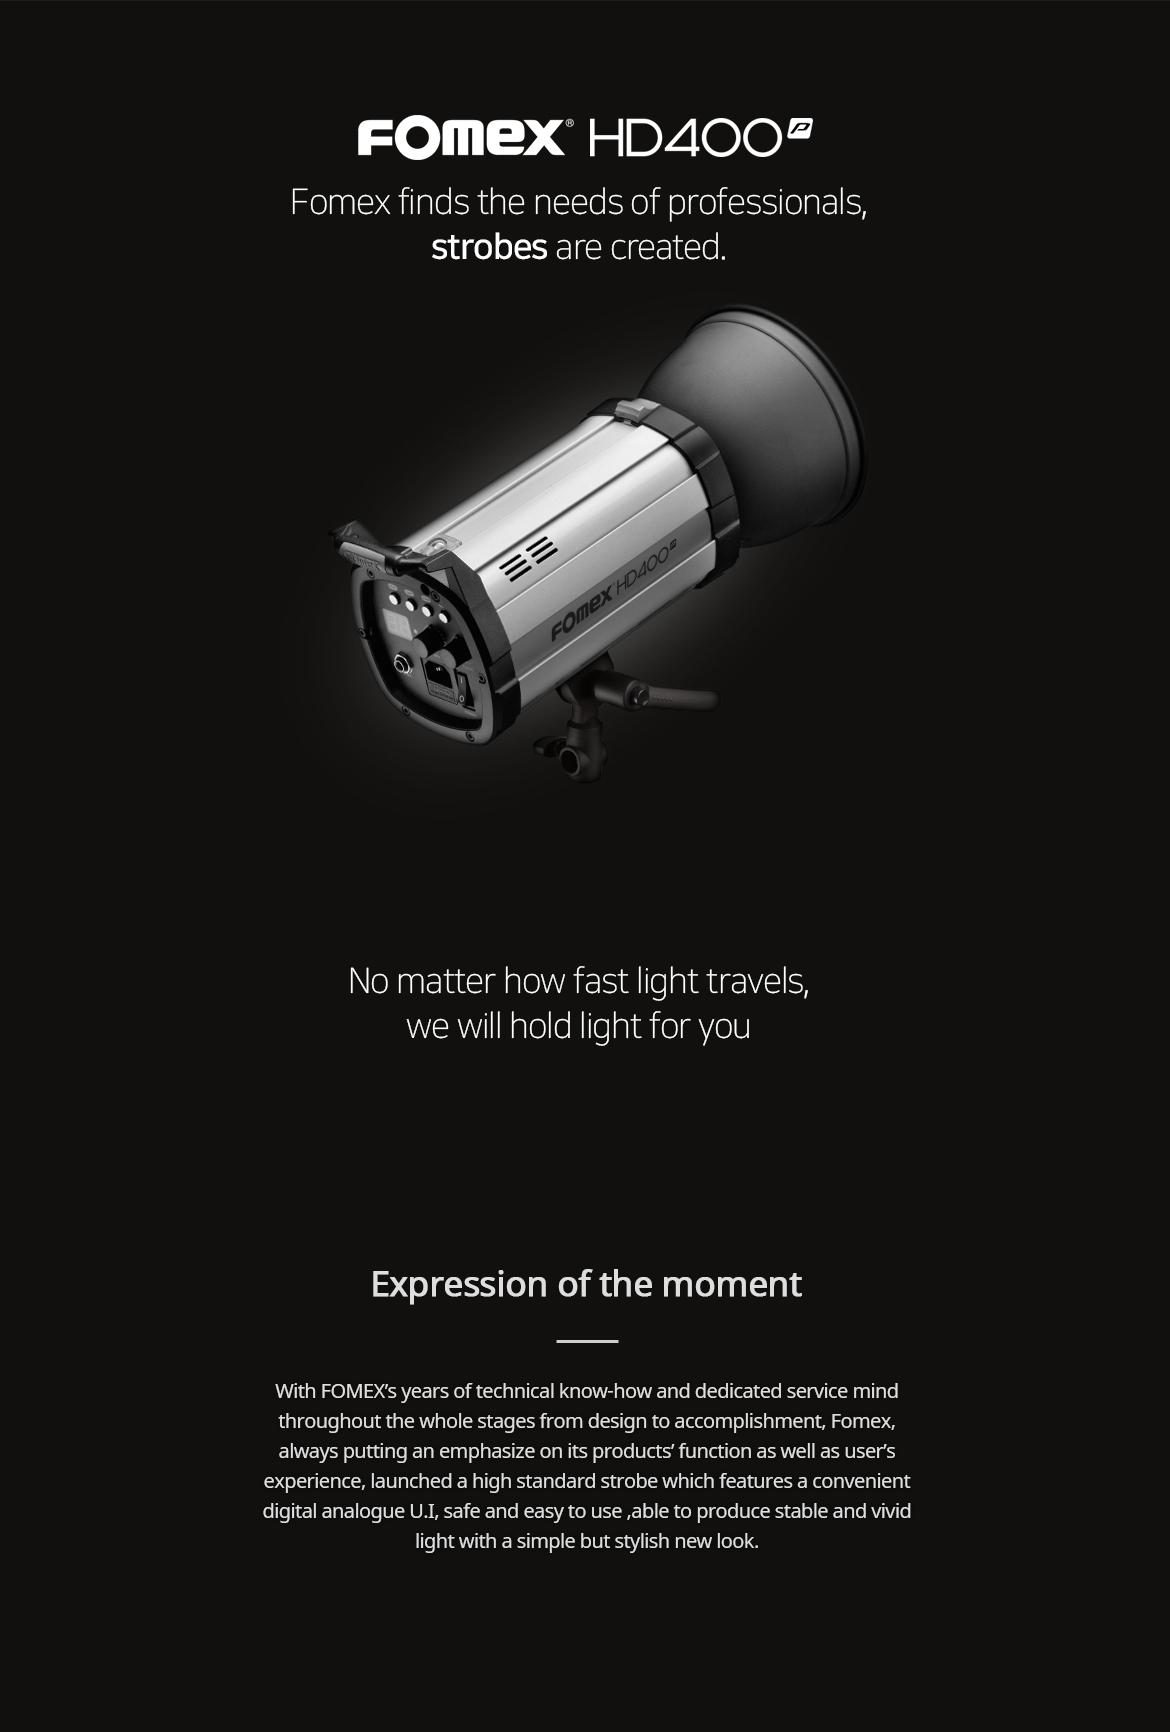 فلاش استودیویی 400 ژول فومکس  (Fomex Dprop Studio Flash 400ws (HD400p